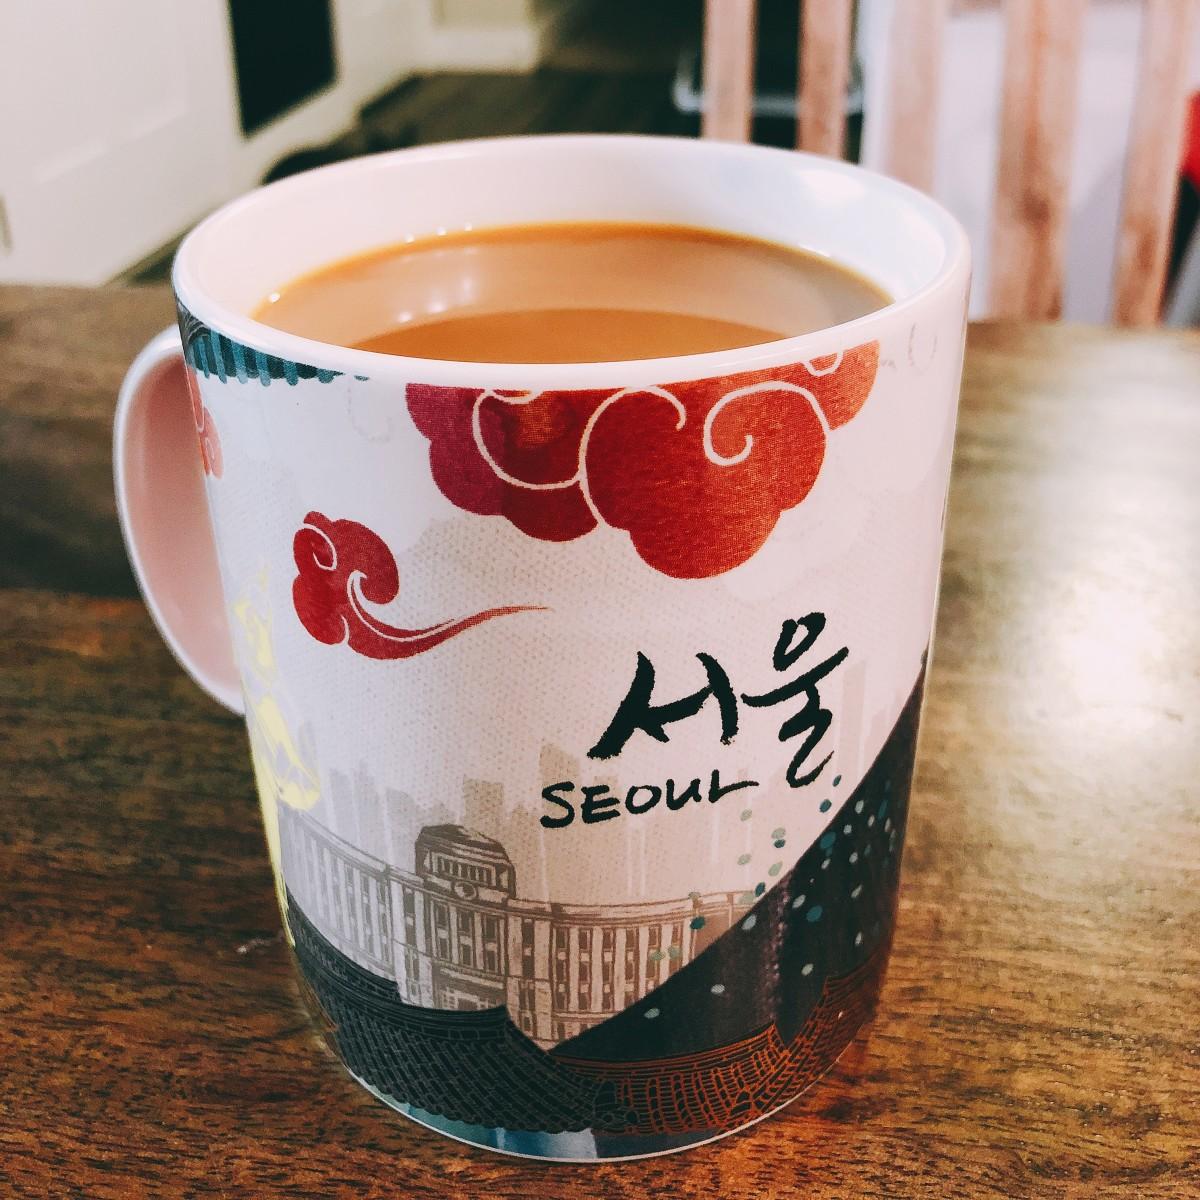 Nothing beats a mug of warm coffee at home.